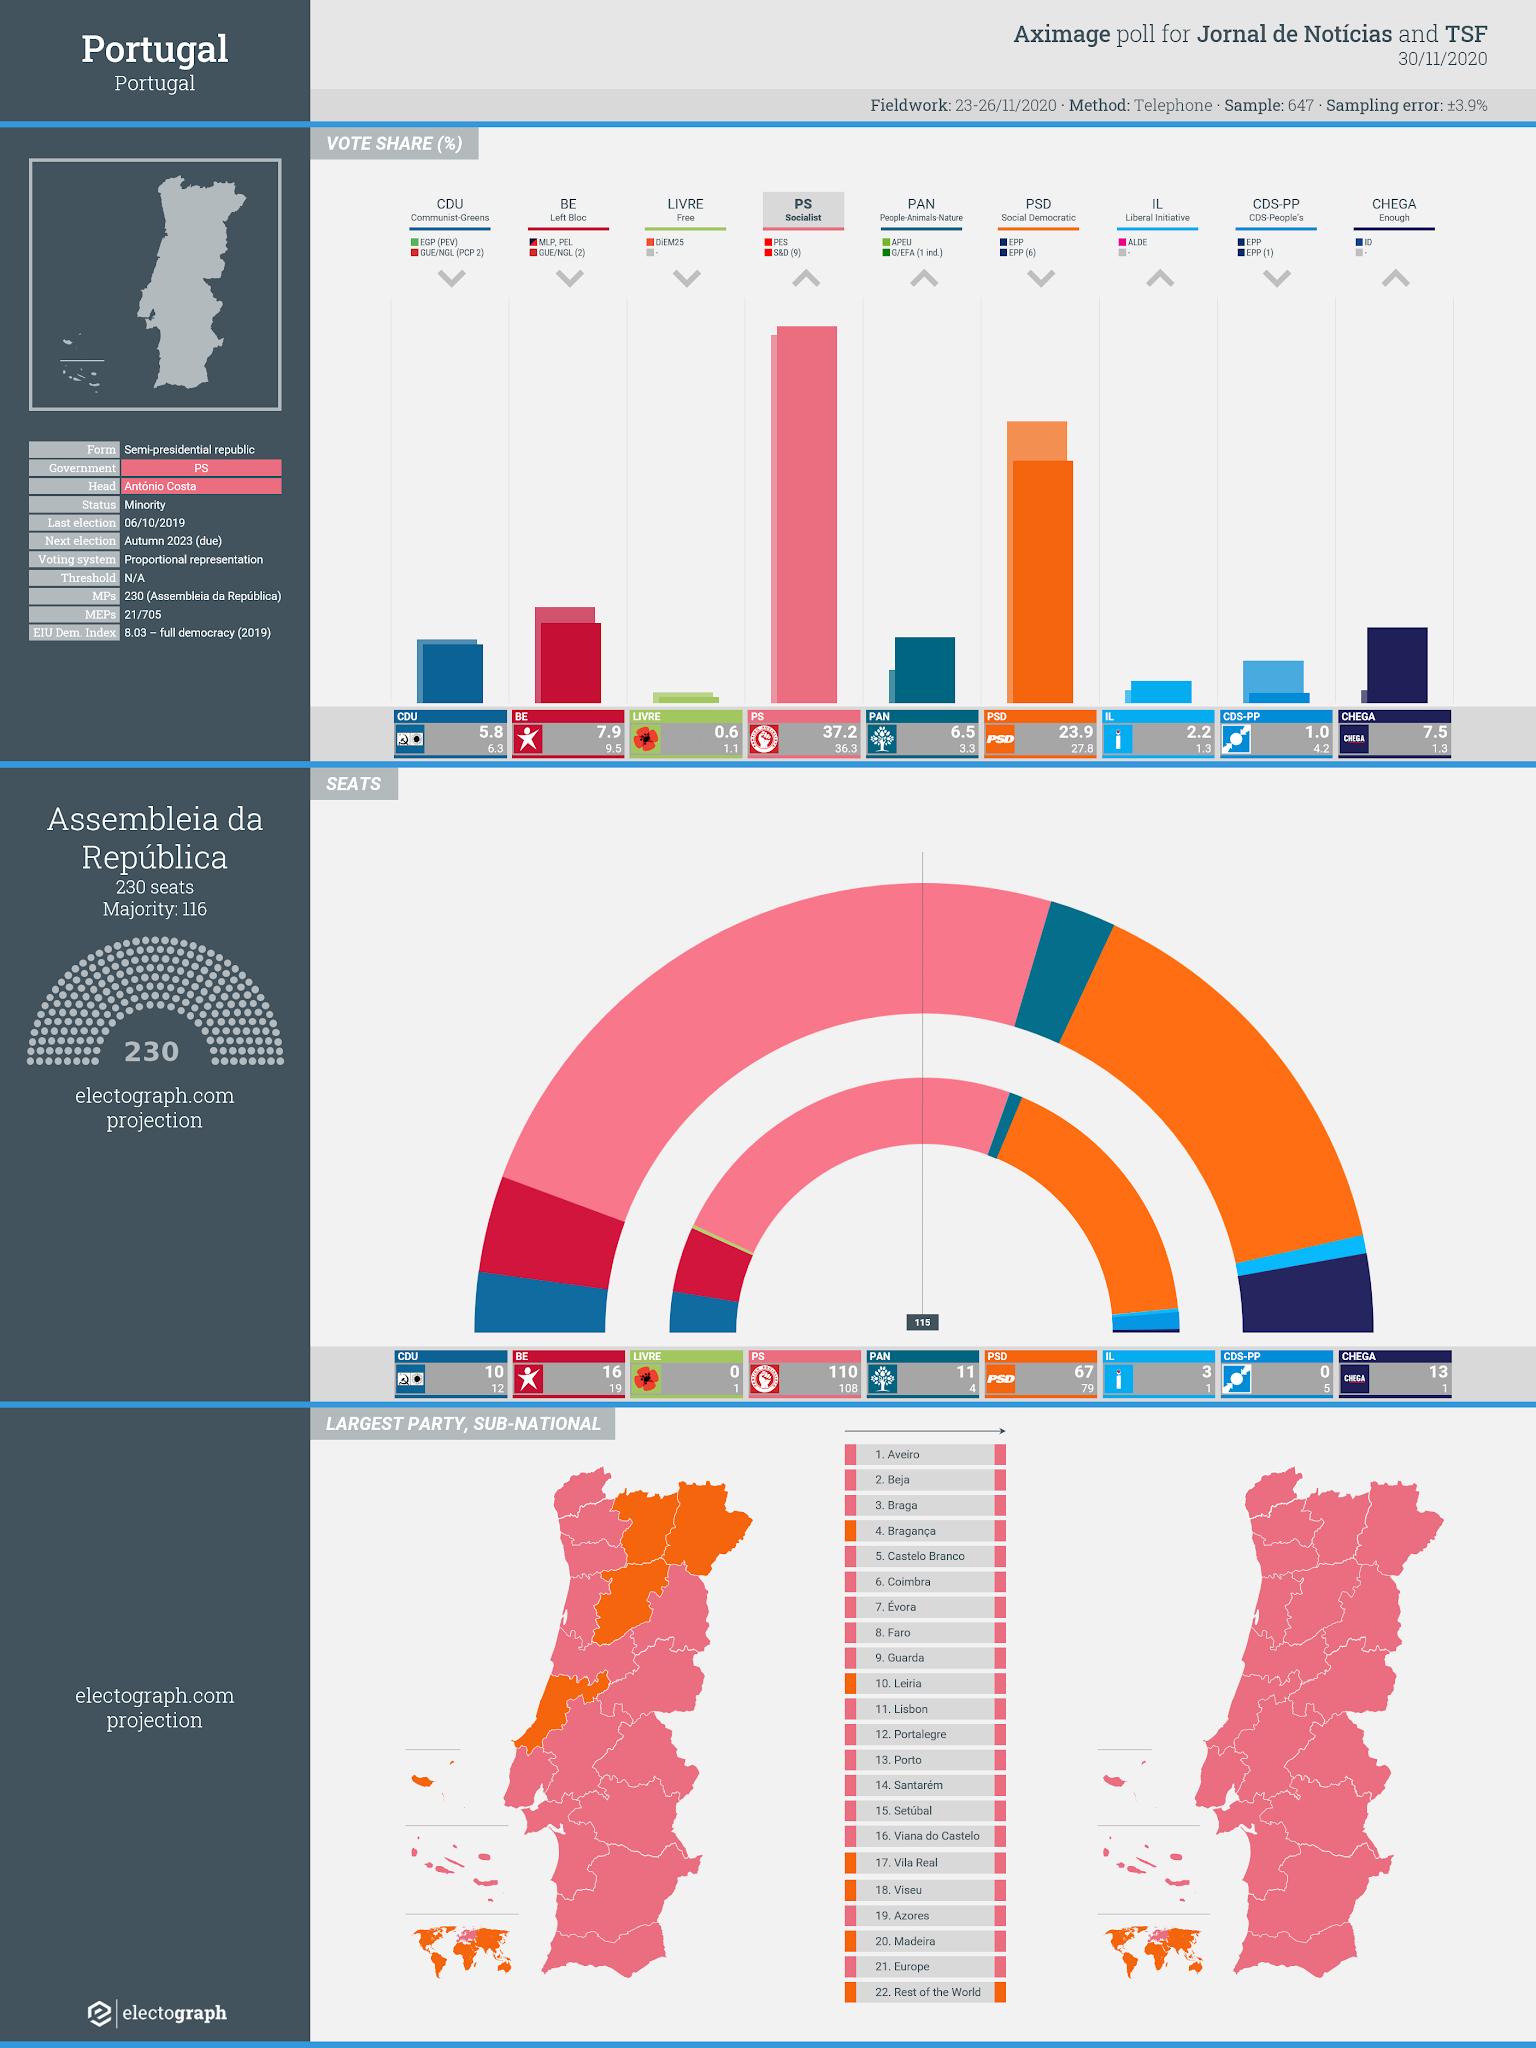 PORTUGAL: Aximage poll chart for Jornal de Notícias and TSF, 30 November 2020